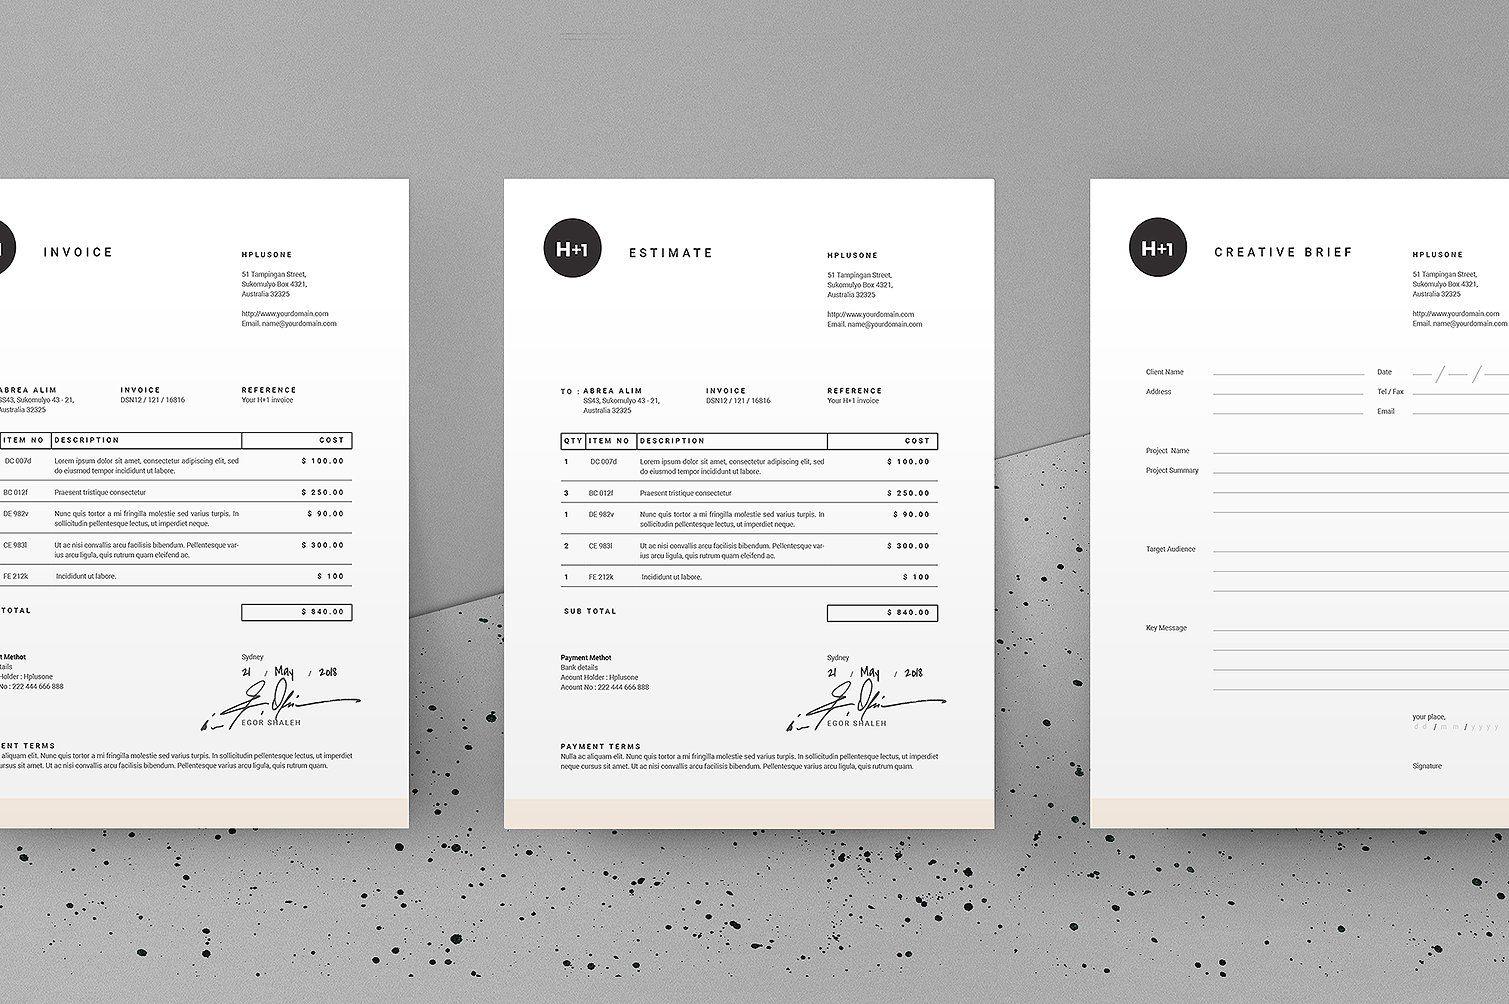 Invoice  Estimate  Brief  Typography